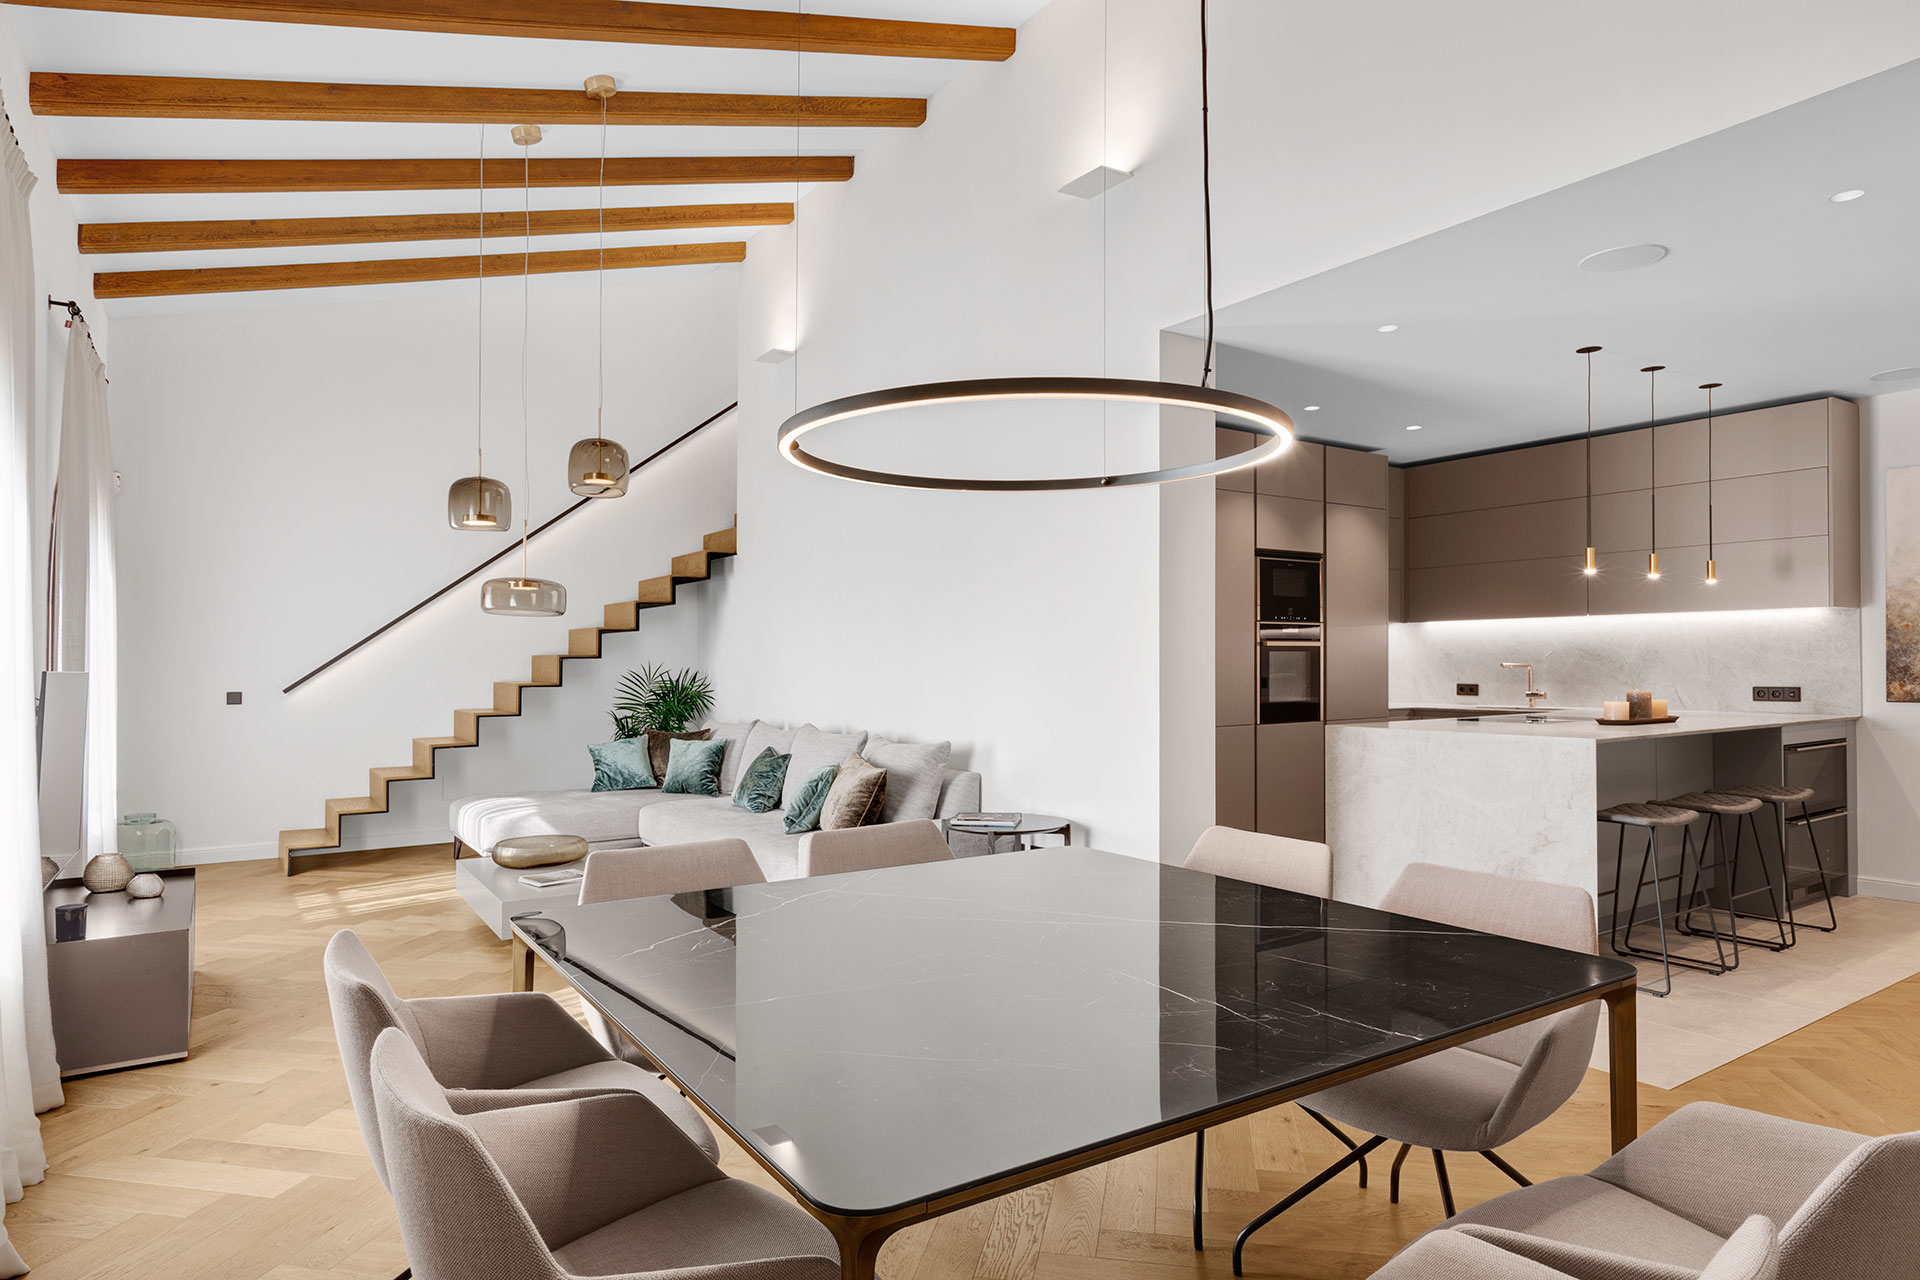 Bienvenido a Marga Comas Interior Design